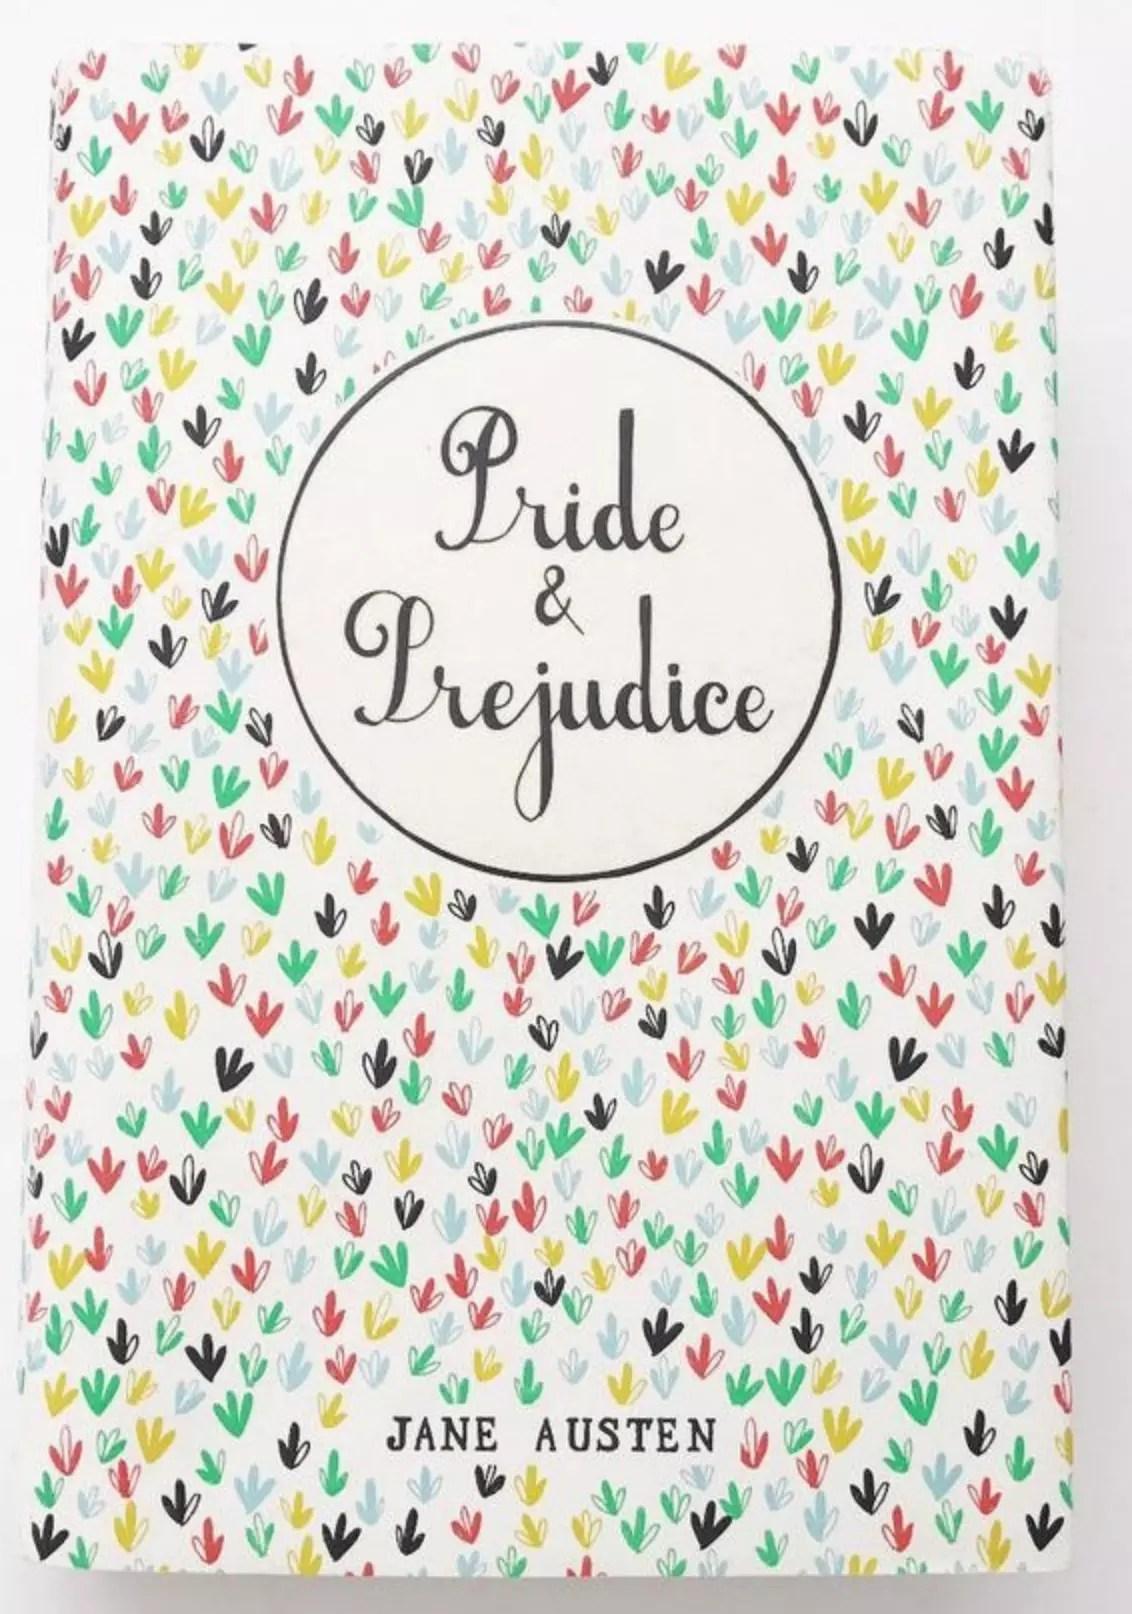 Boddington Austen Pride Prejudice dj